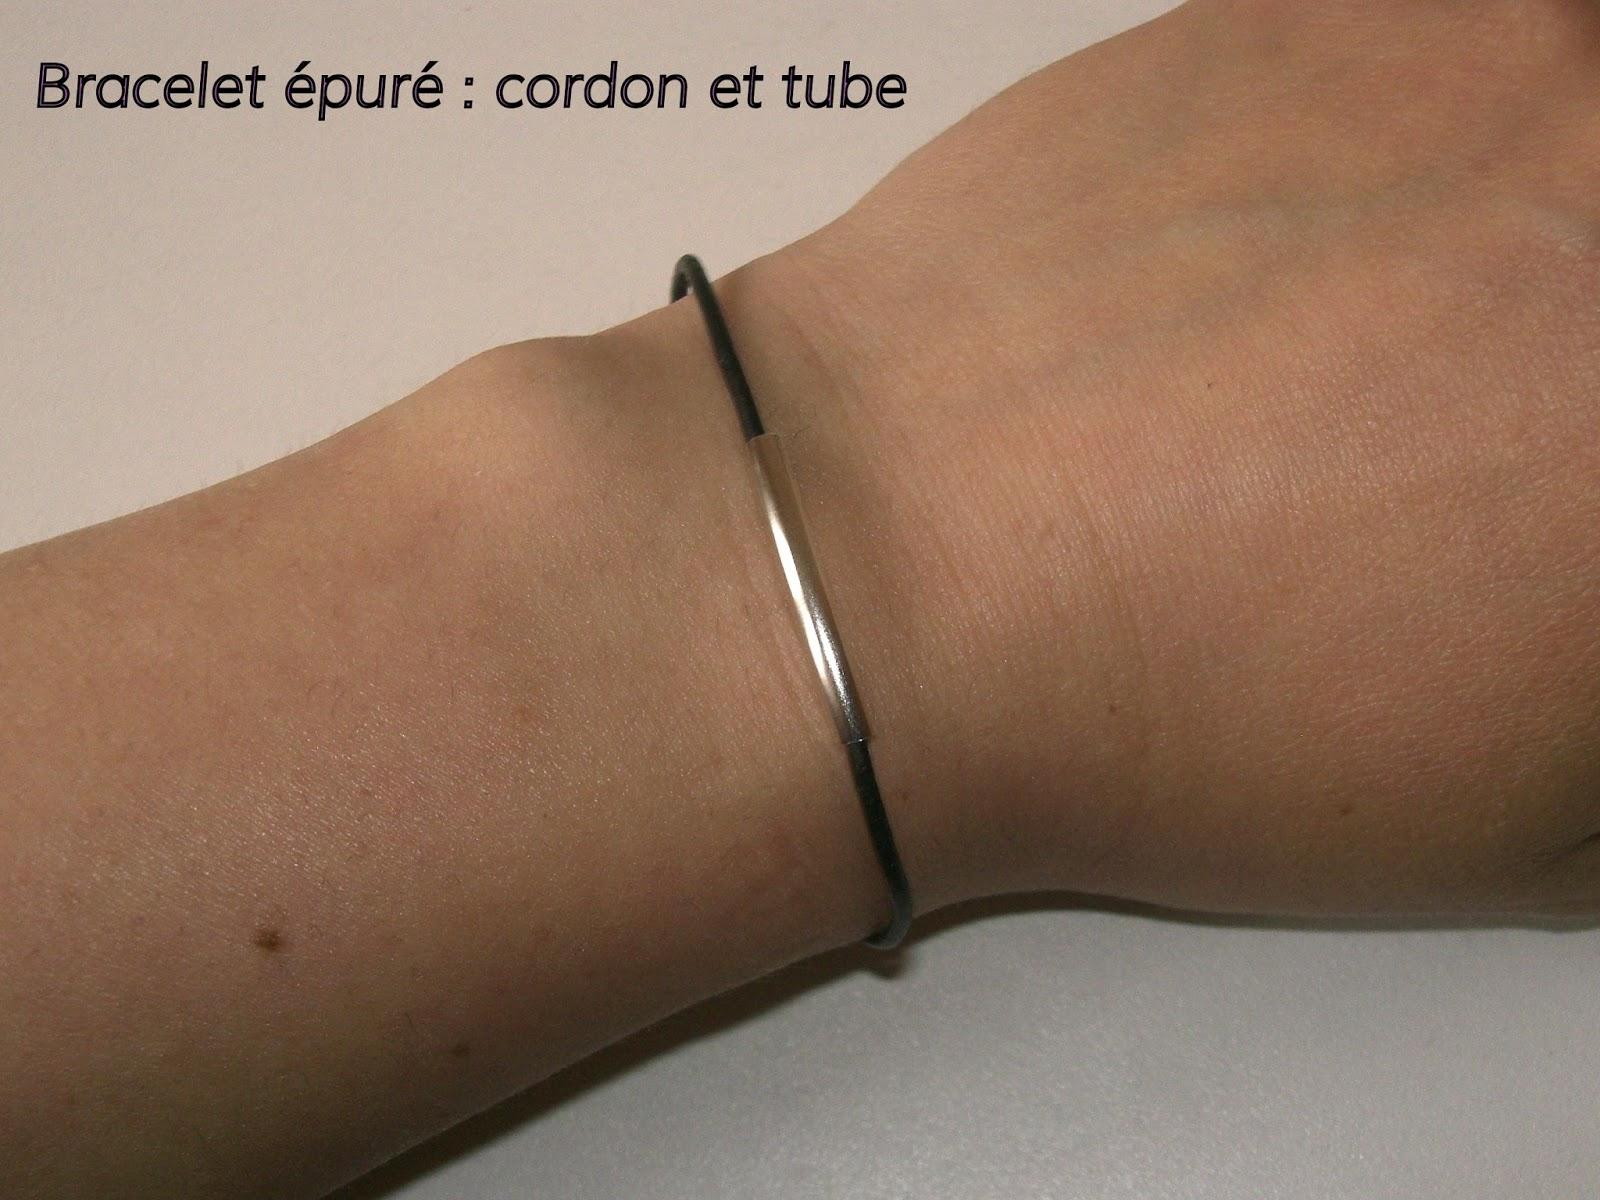 gabulle in wonderland bracelet pur cordon et tube. Black Bedroom Furniture Sets. Home Design Ideas